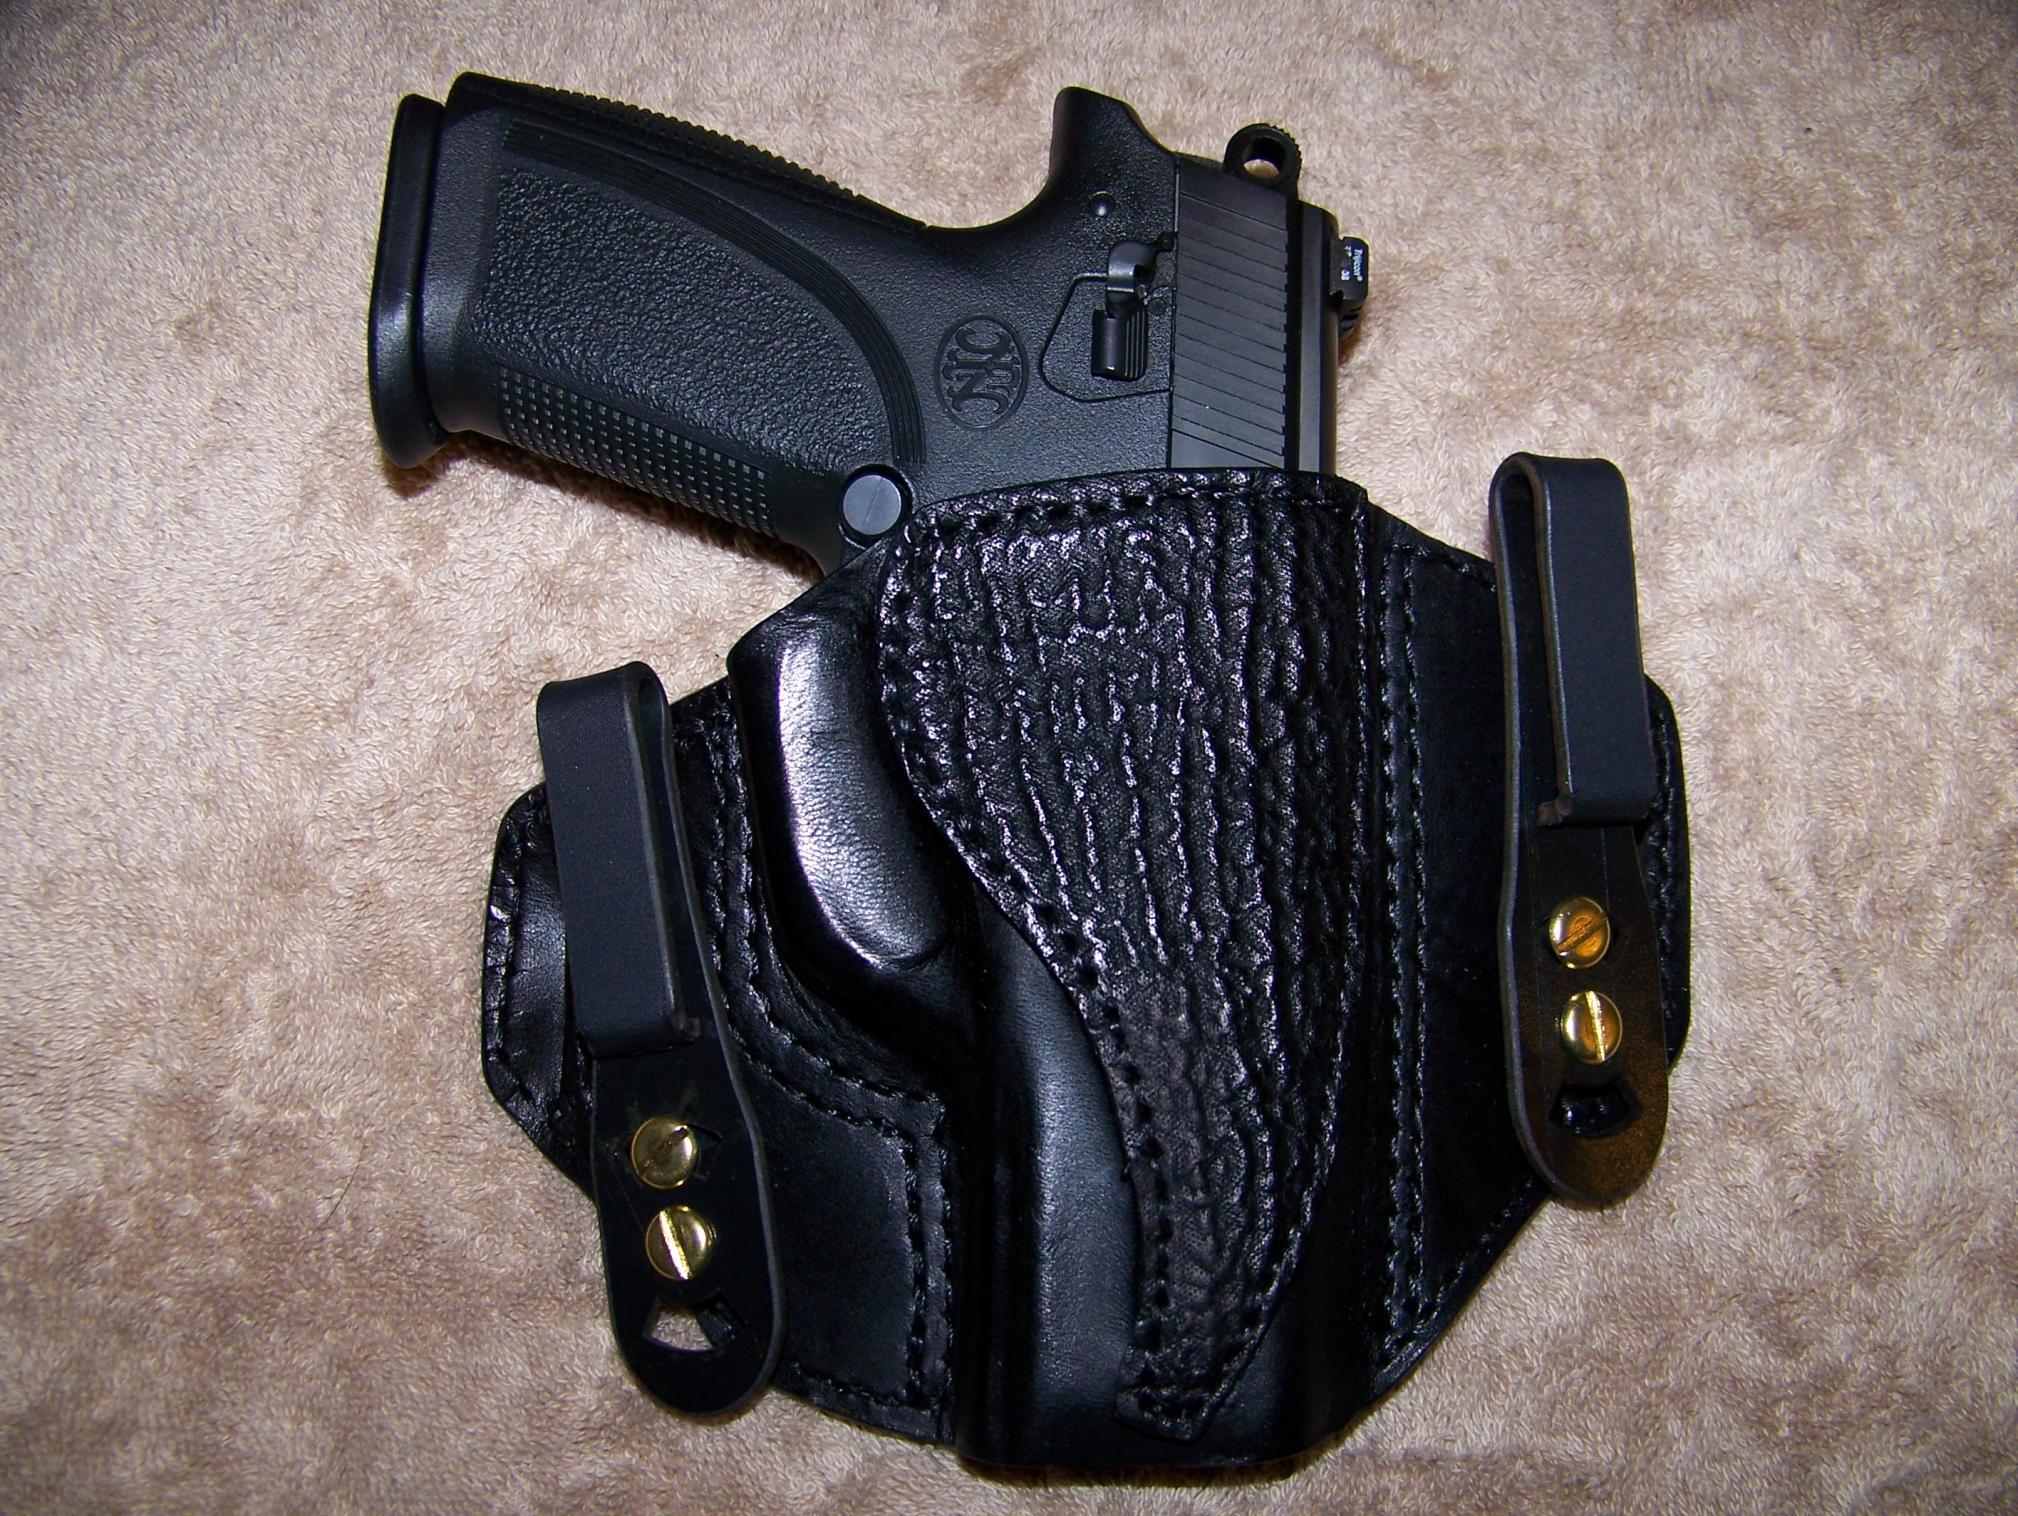 FNP-9 carry holster-praxis2.jpg